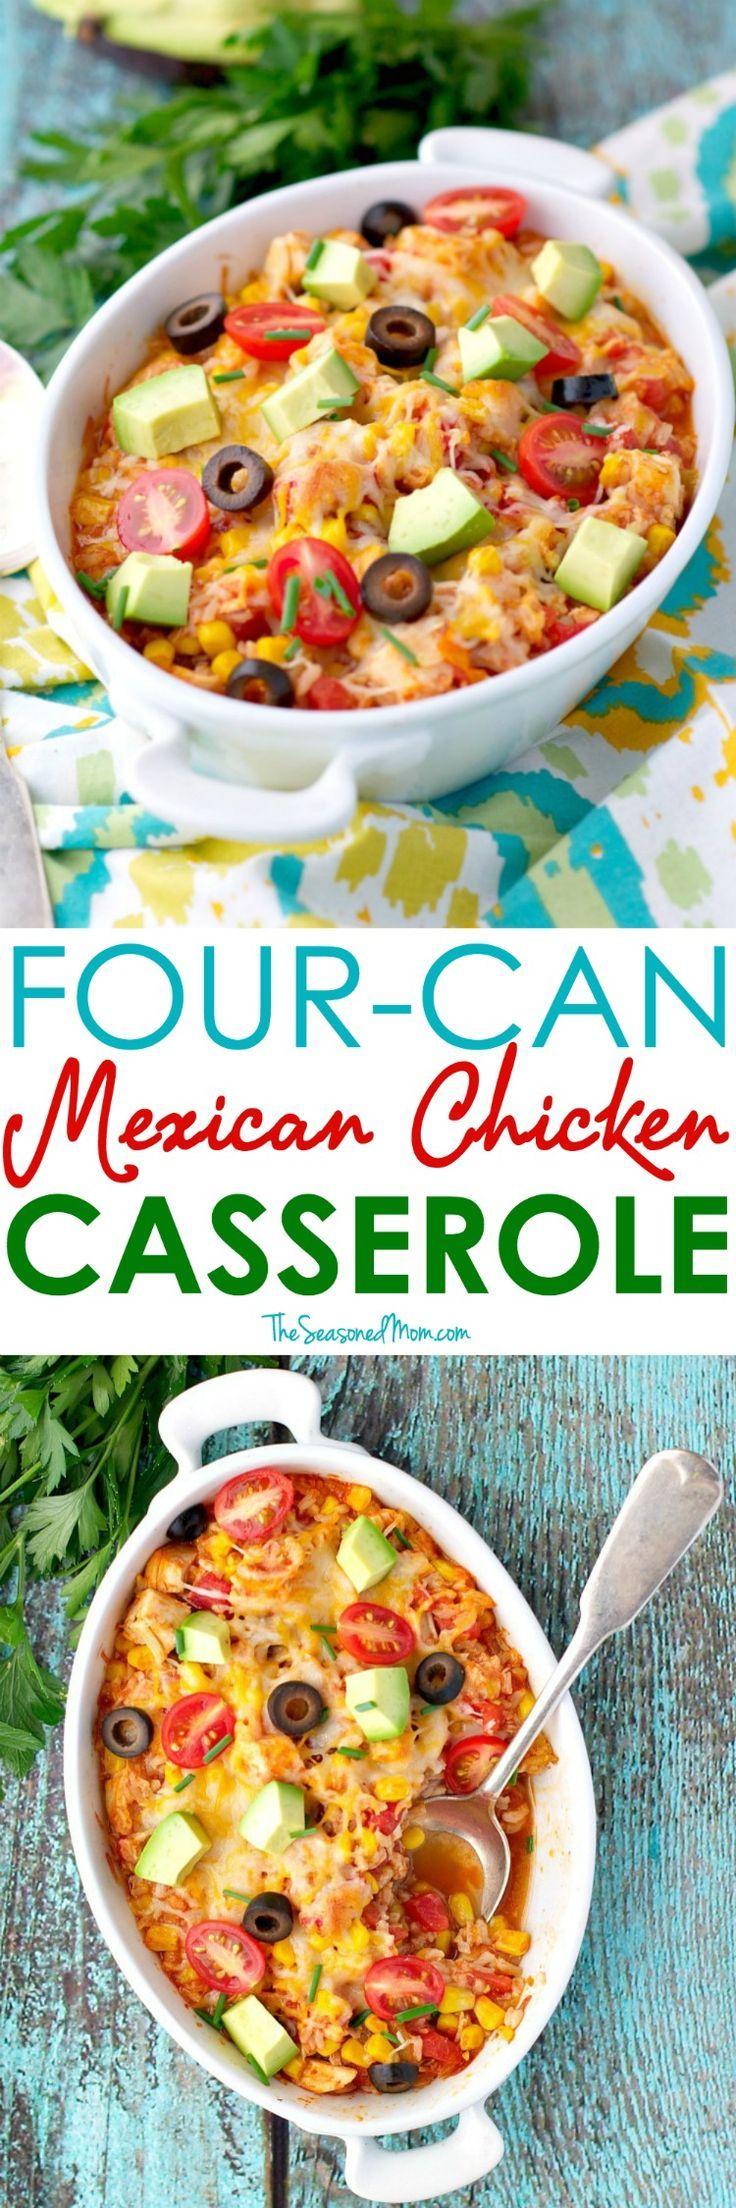 Low Fat Low Carb Casserole Recipes